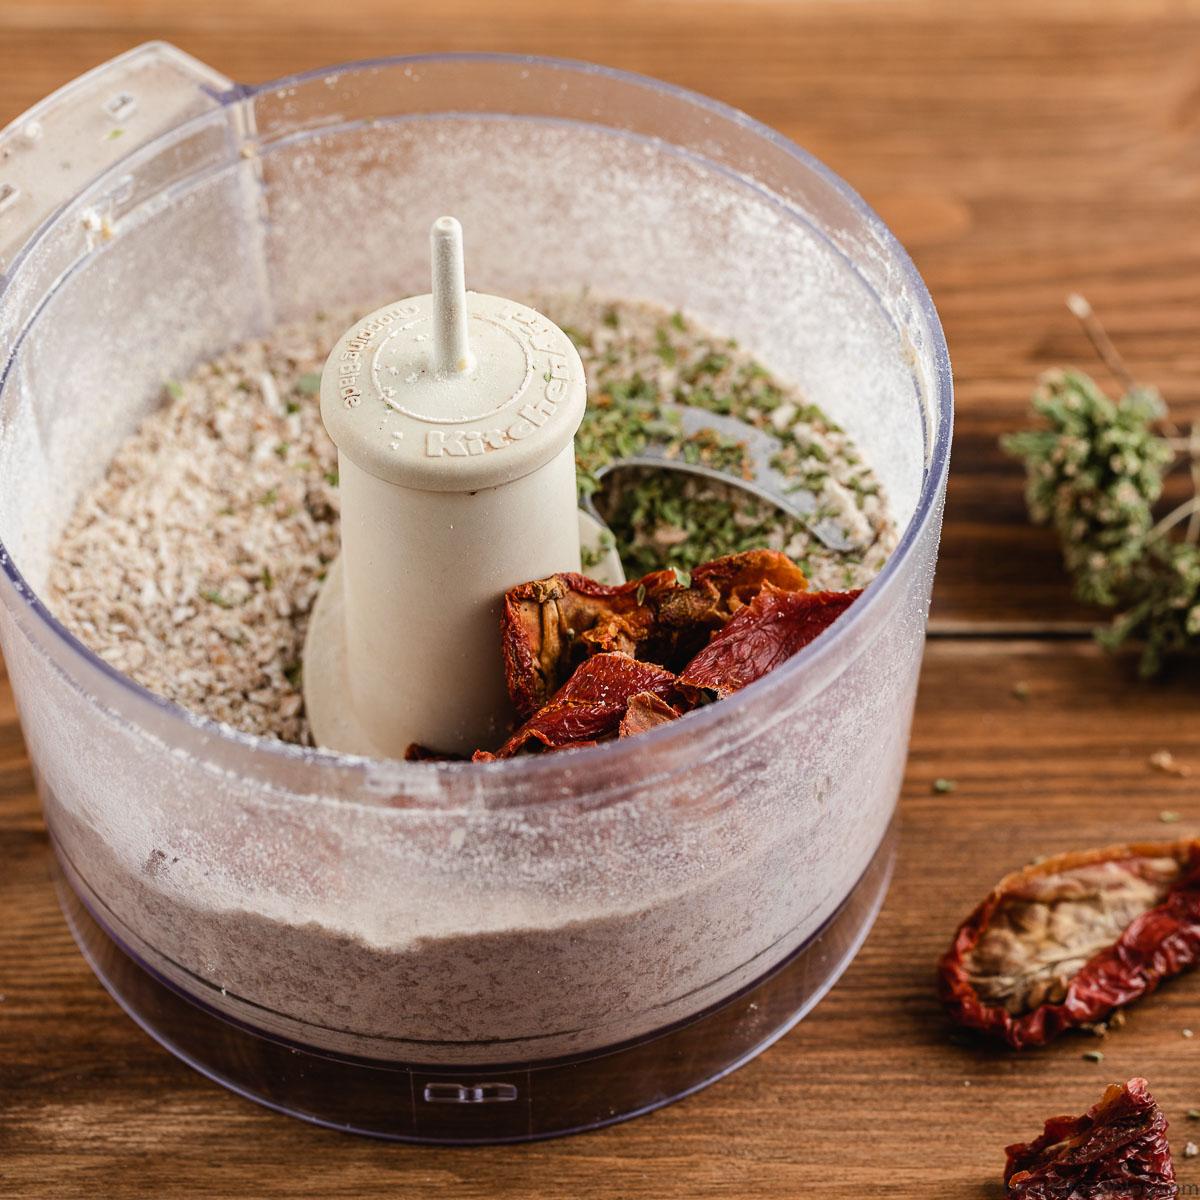 robot da cucina con ingredienti frullati e pomodori secchi food processor with flours and dry ingredients blended and sun-dreid tomatoes